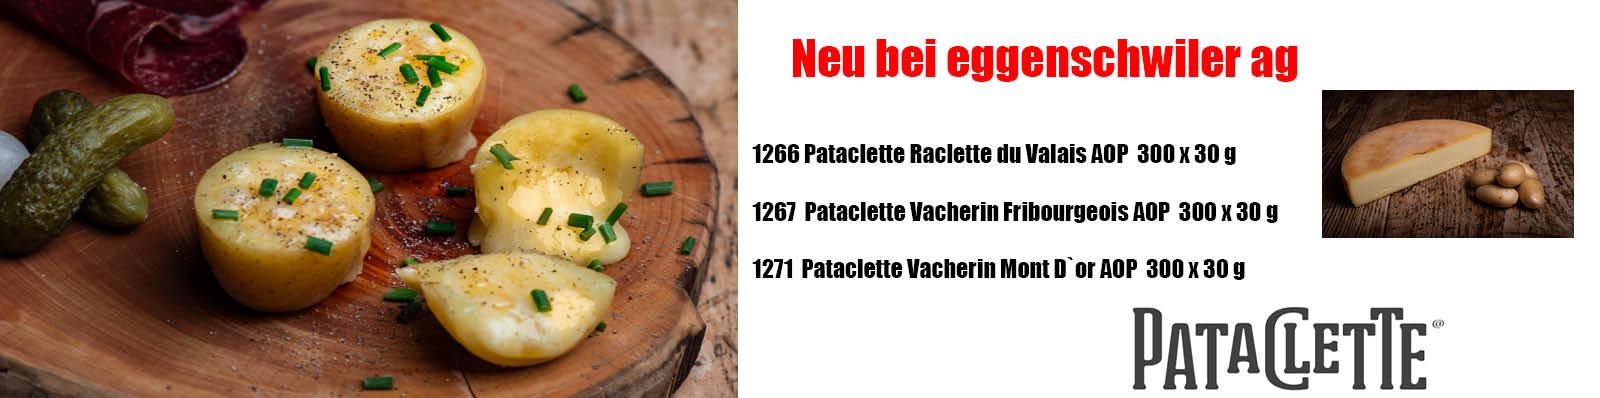 Pataclette_2021